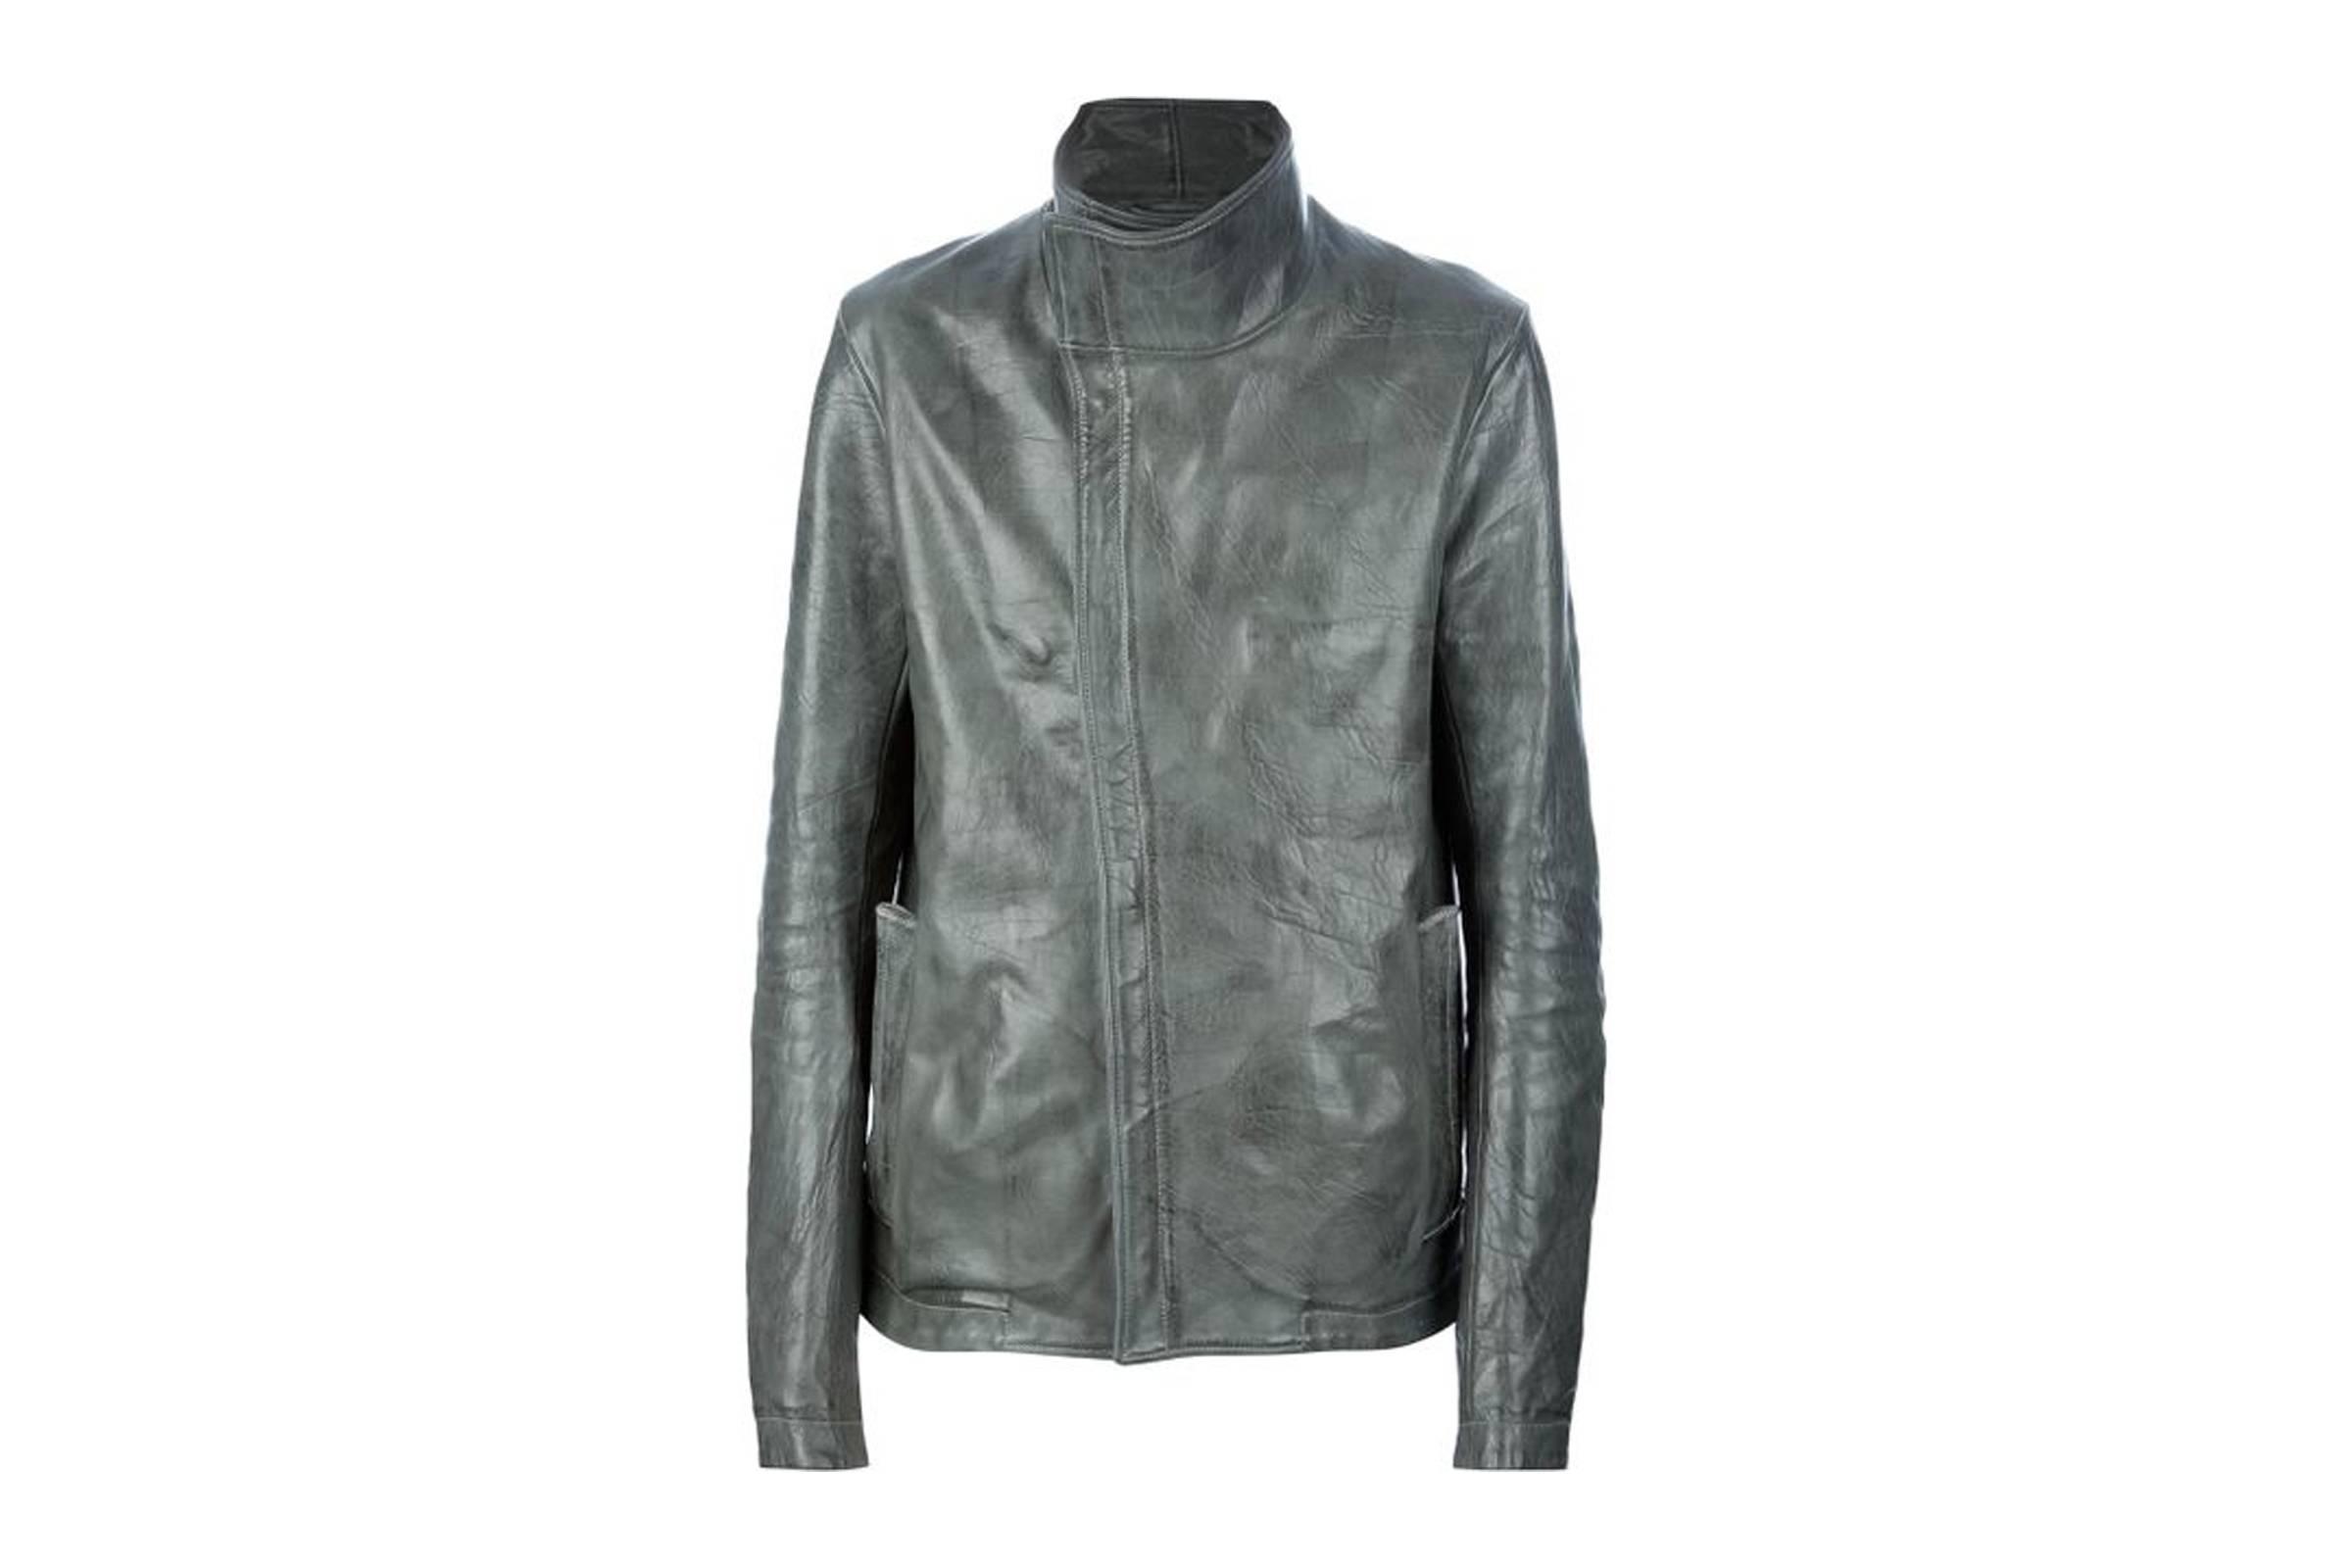 3. Carol Christian Poell High Neck Leather Jacket